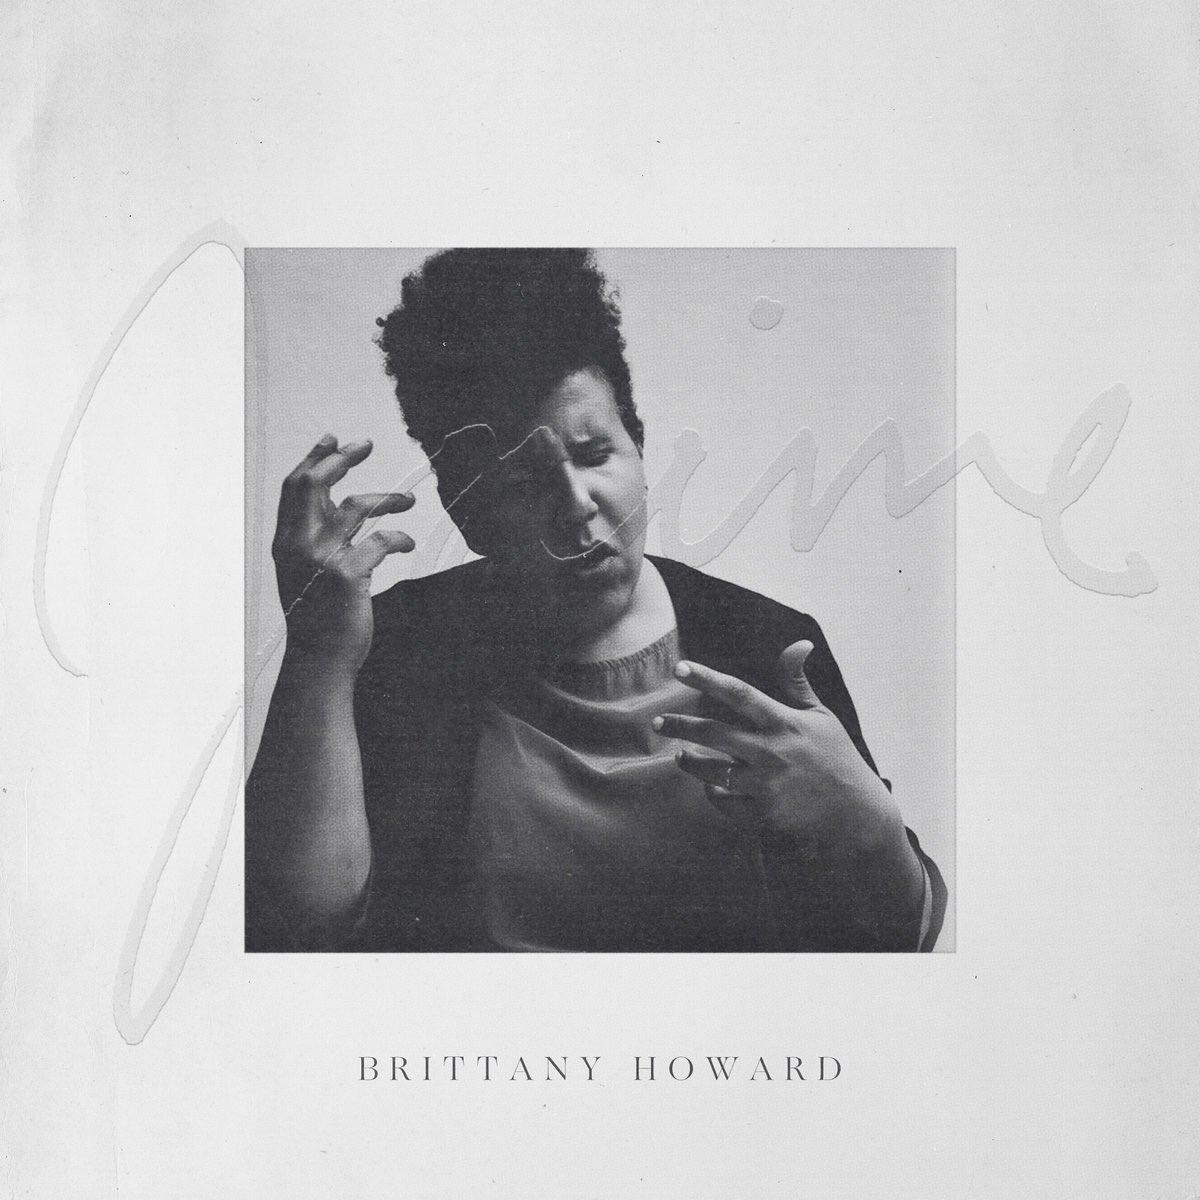 Alabama ShakesのBrittany Howardがソロ・アルバム『Jaime』を9月20日にリリース🎉アルバムにはRobert Glasper、Nate Smith等が参加しています。Apple Music↓Spotify↓YouTube↓